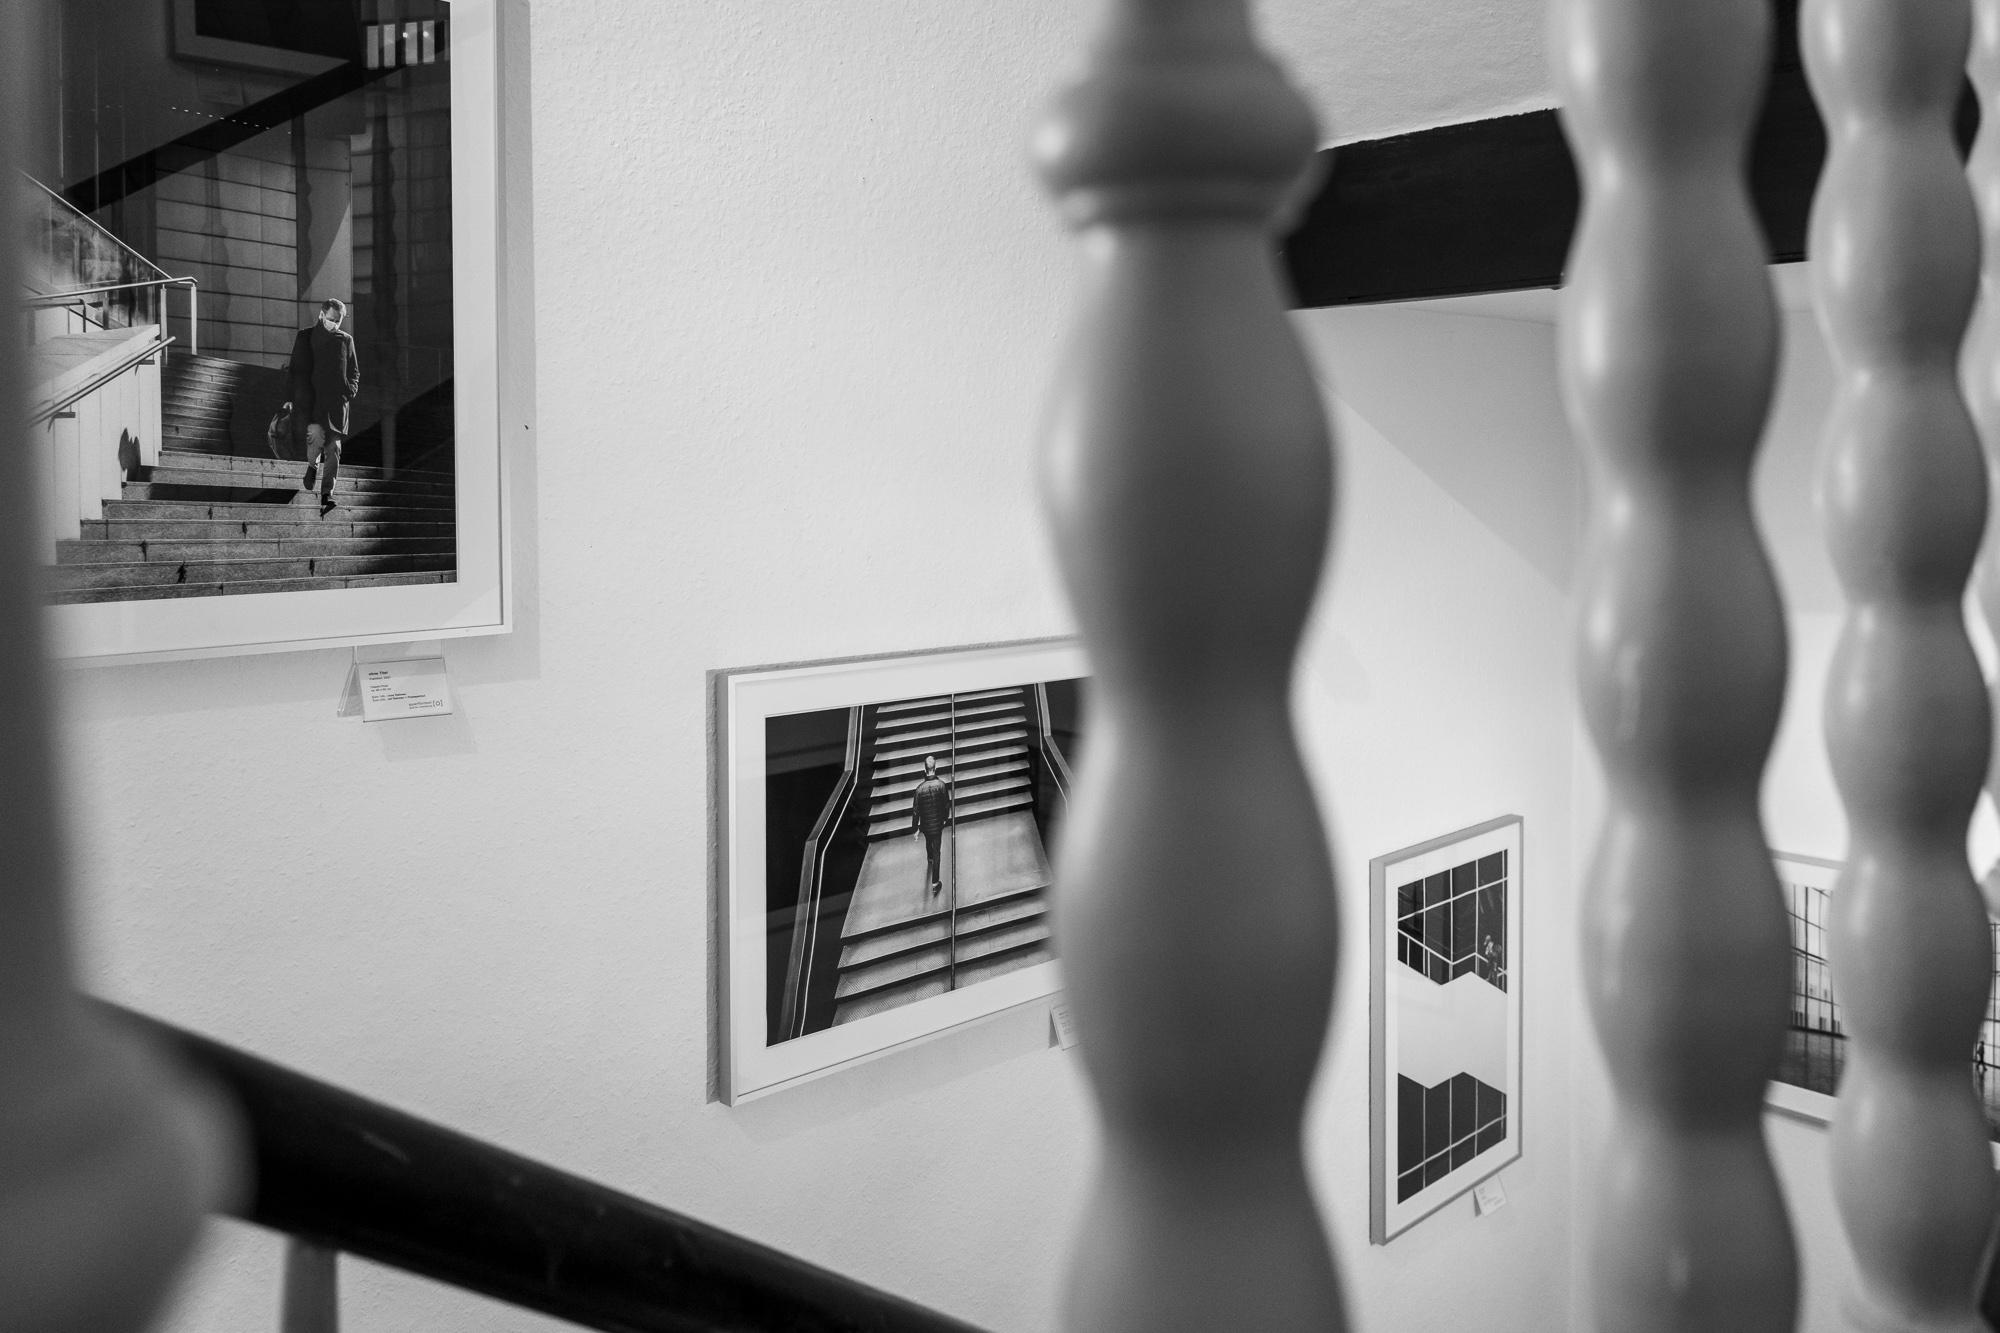 querformat-fotografie - Achim Katzberg - Diverse Motive im Format 60 x 40 - querformat-fotografie_Fototreppe_42-002